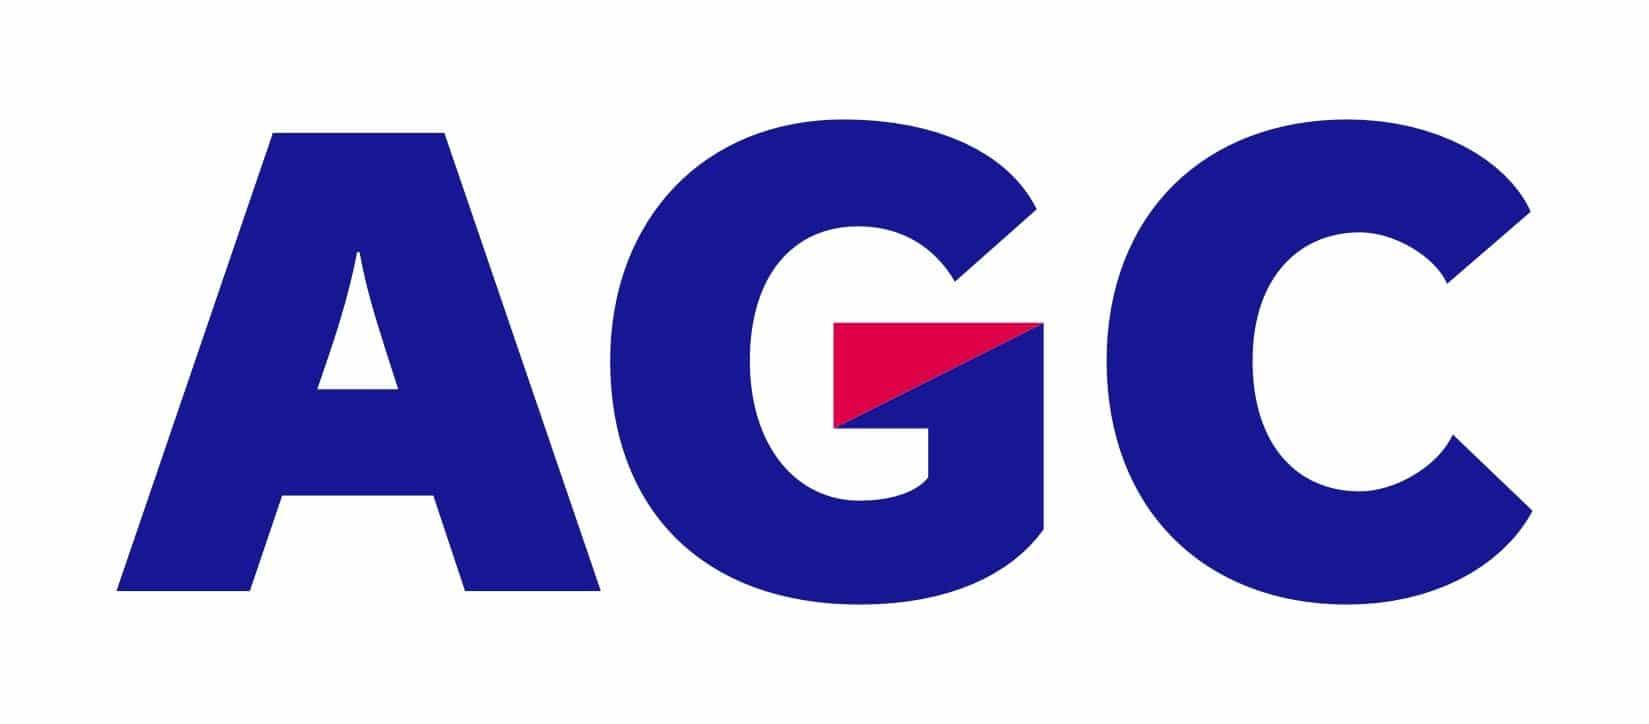 AGC - Formation managériale